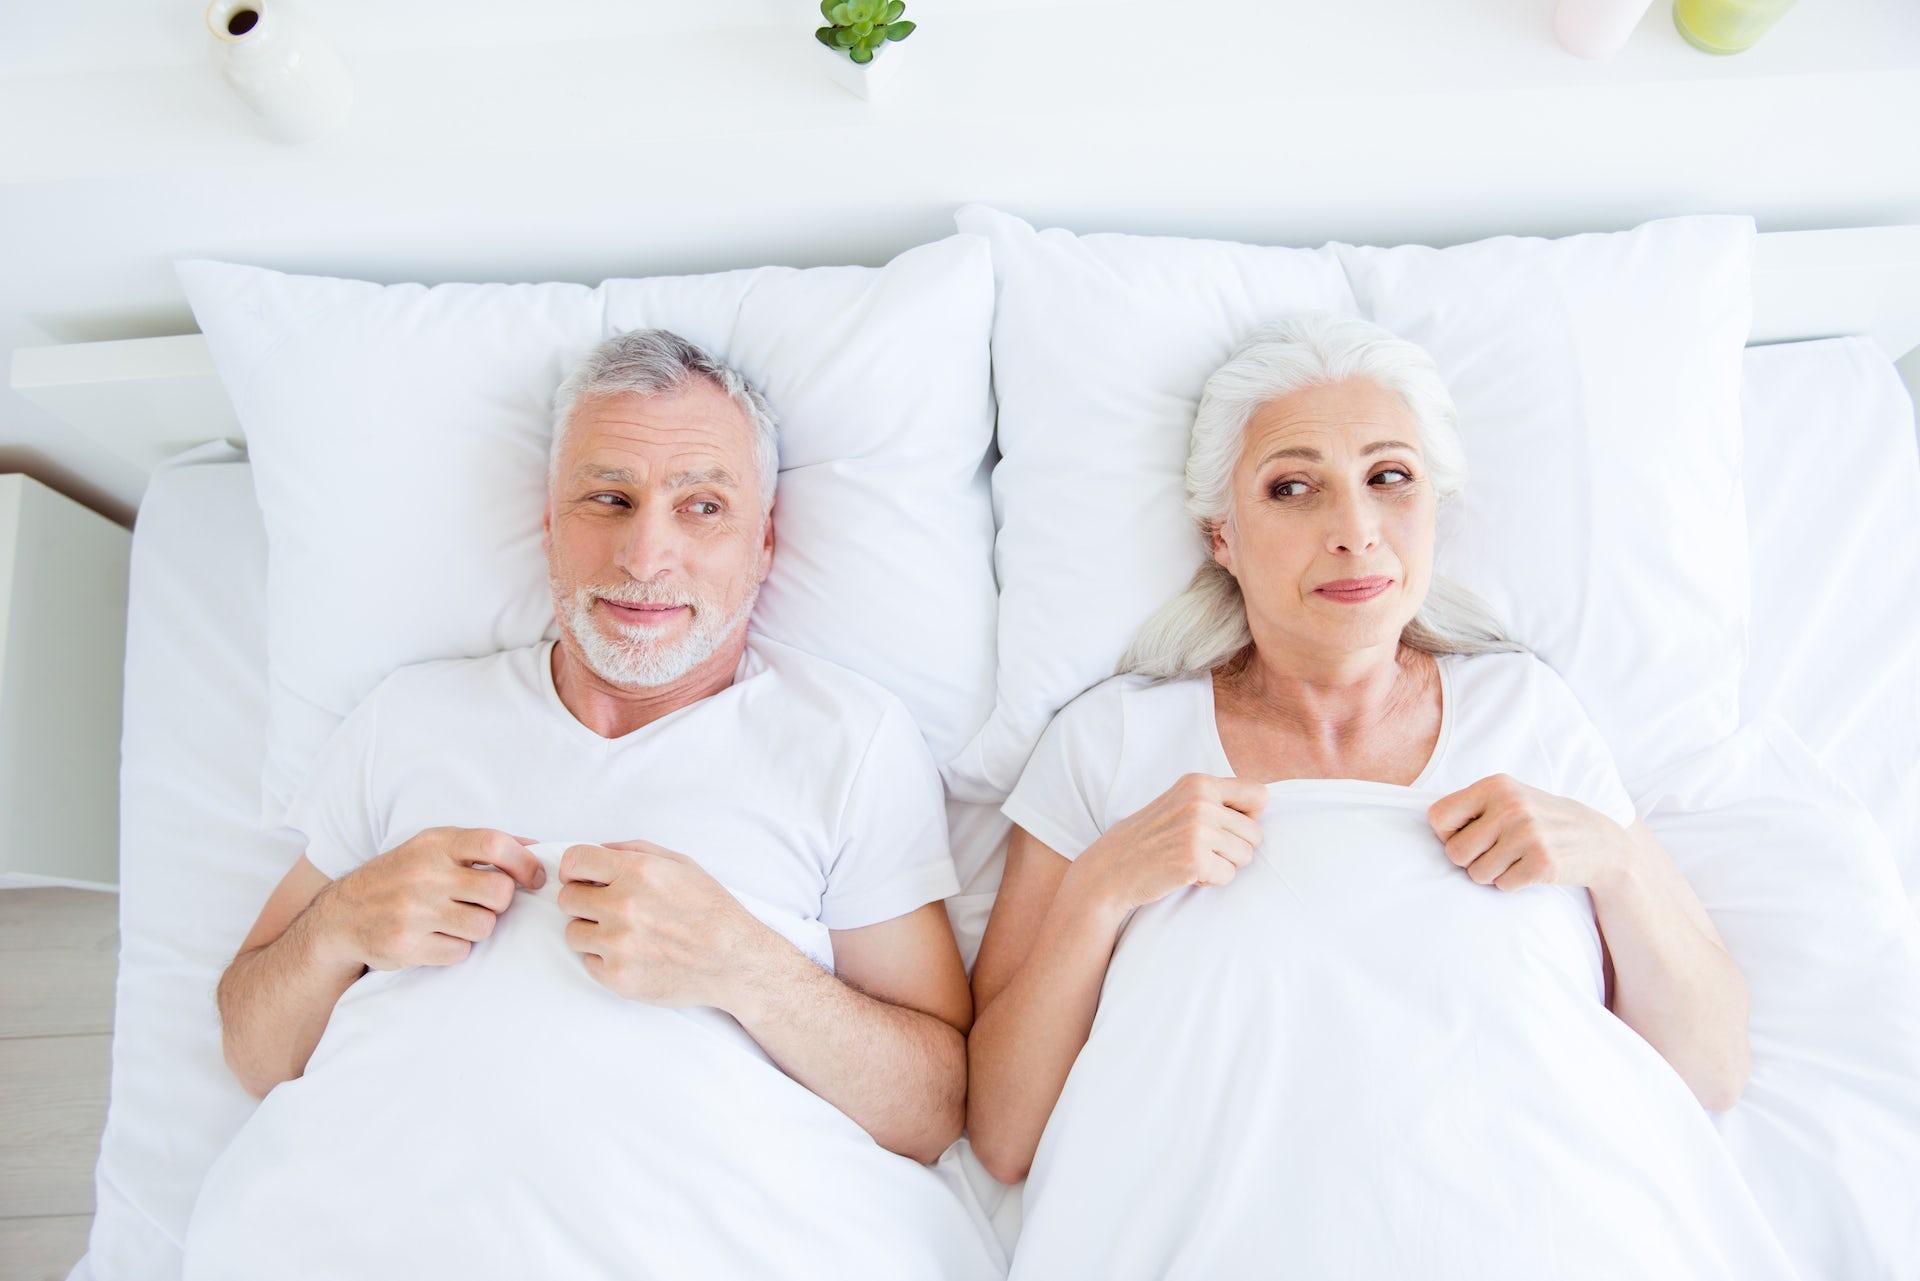 Do you ladies enjoy sex after 60